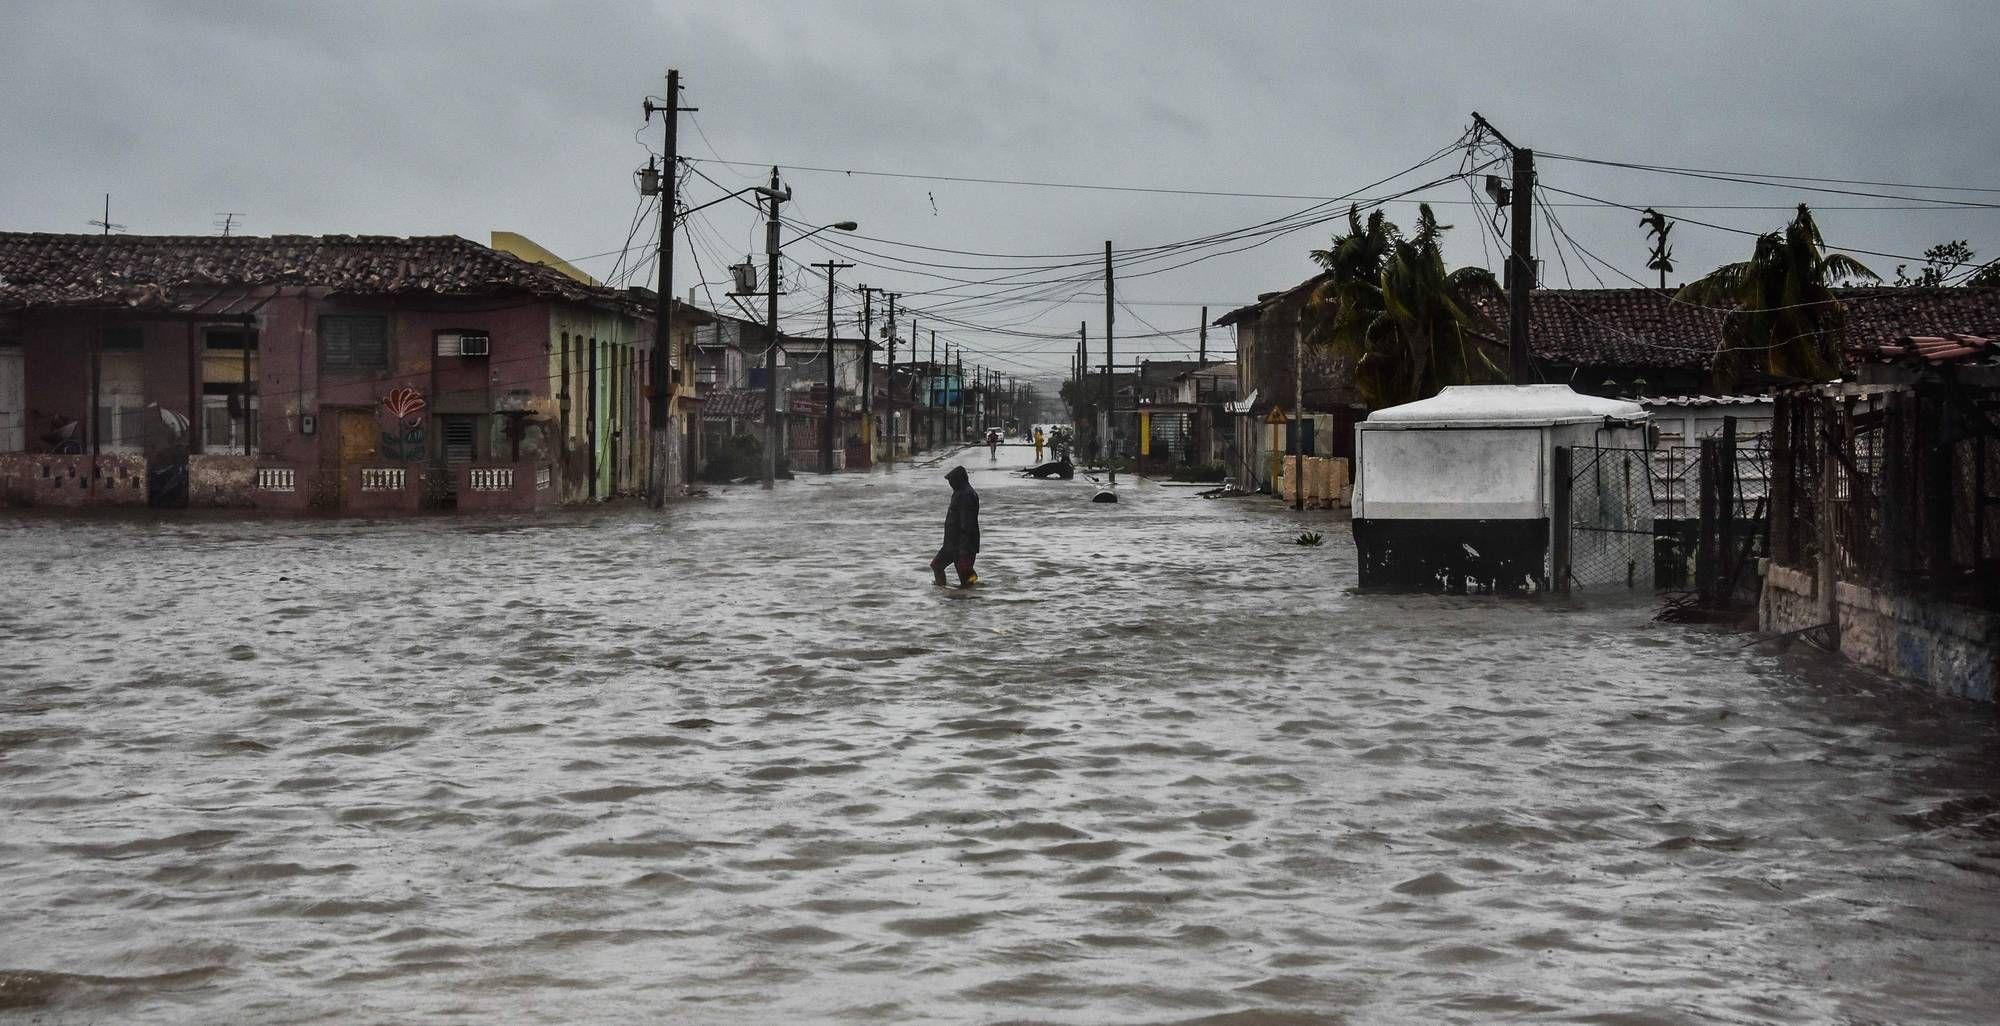 Irma S Eyewall Reaches Florida Keys Florida National Hurricane Center Island Nations